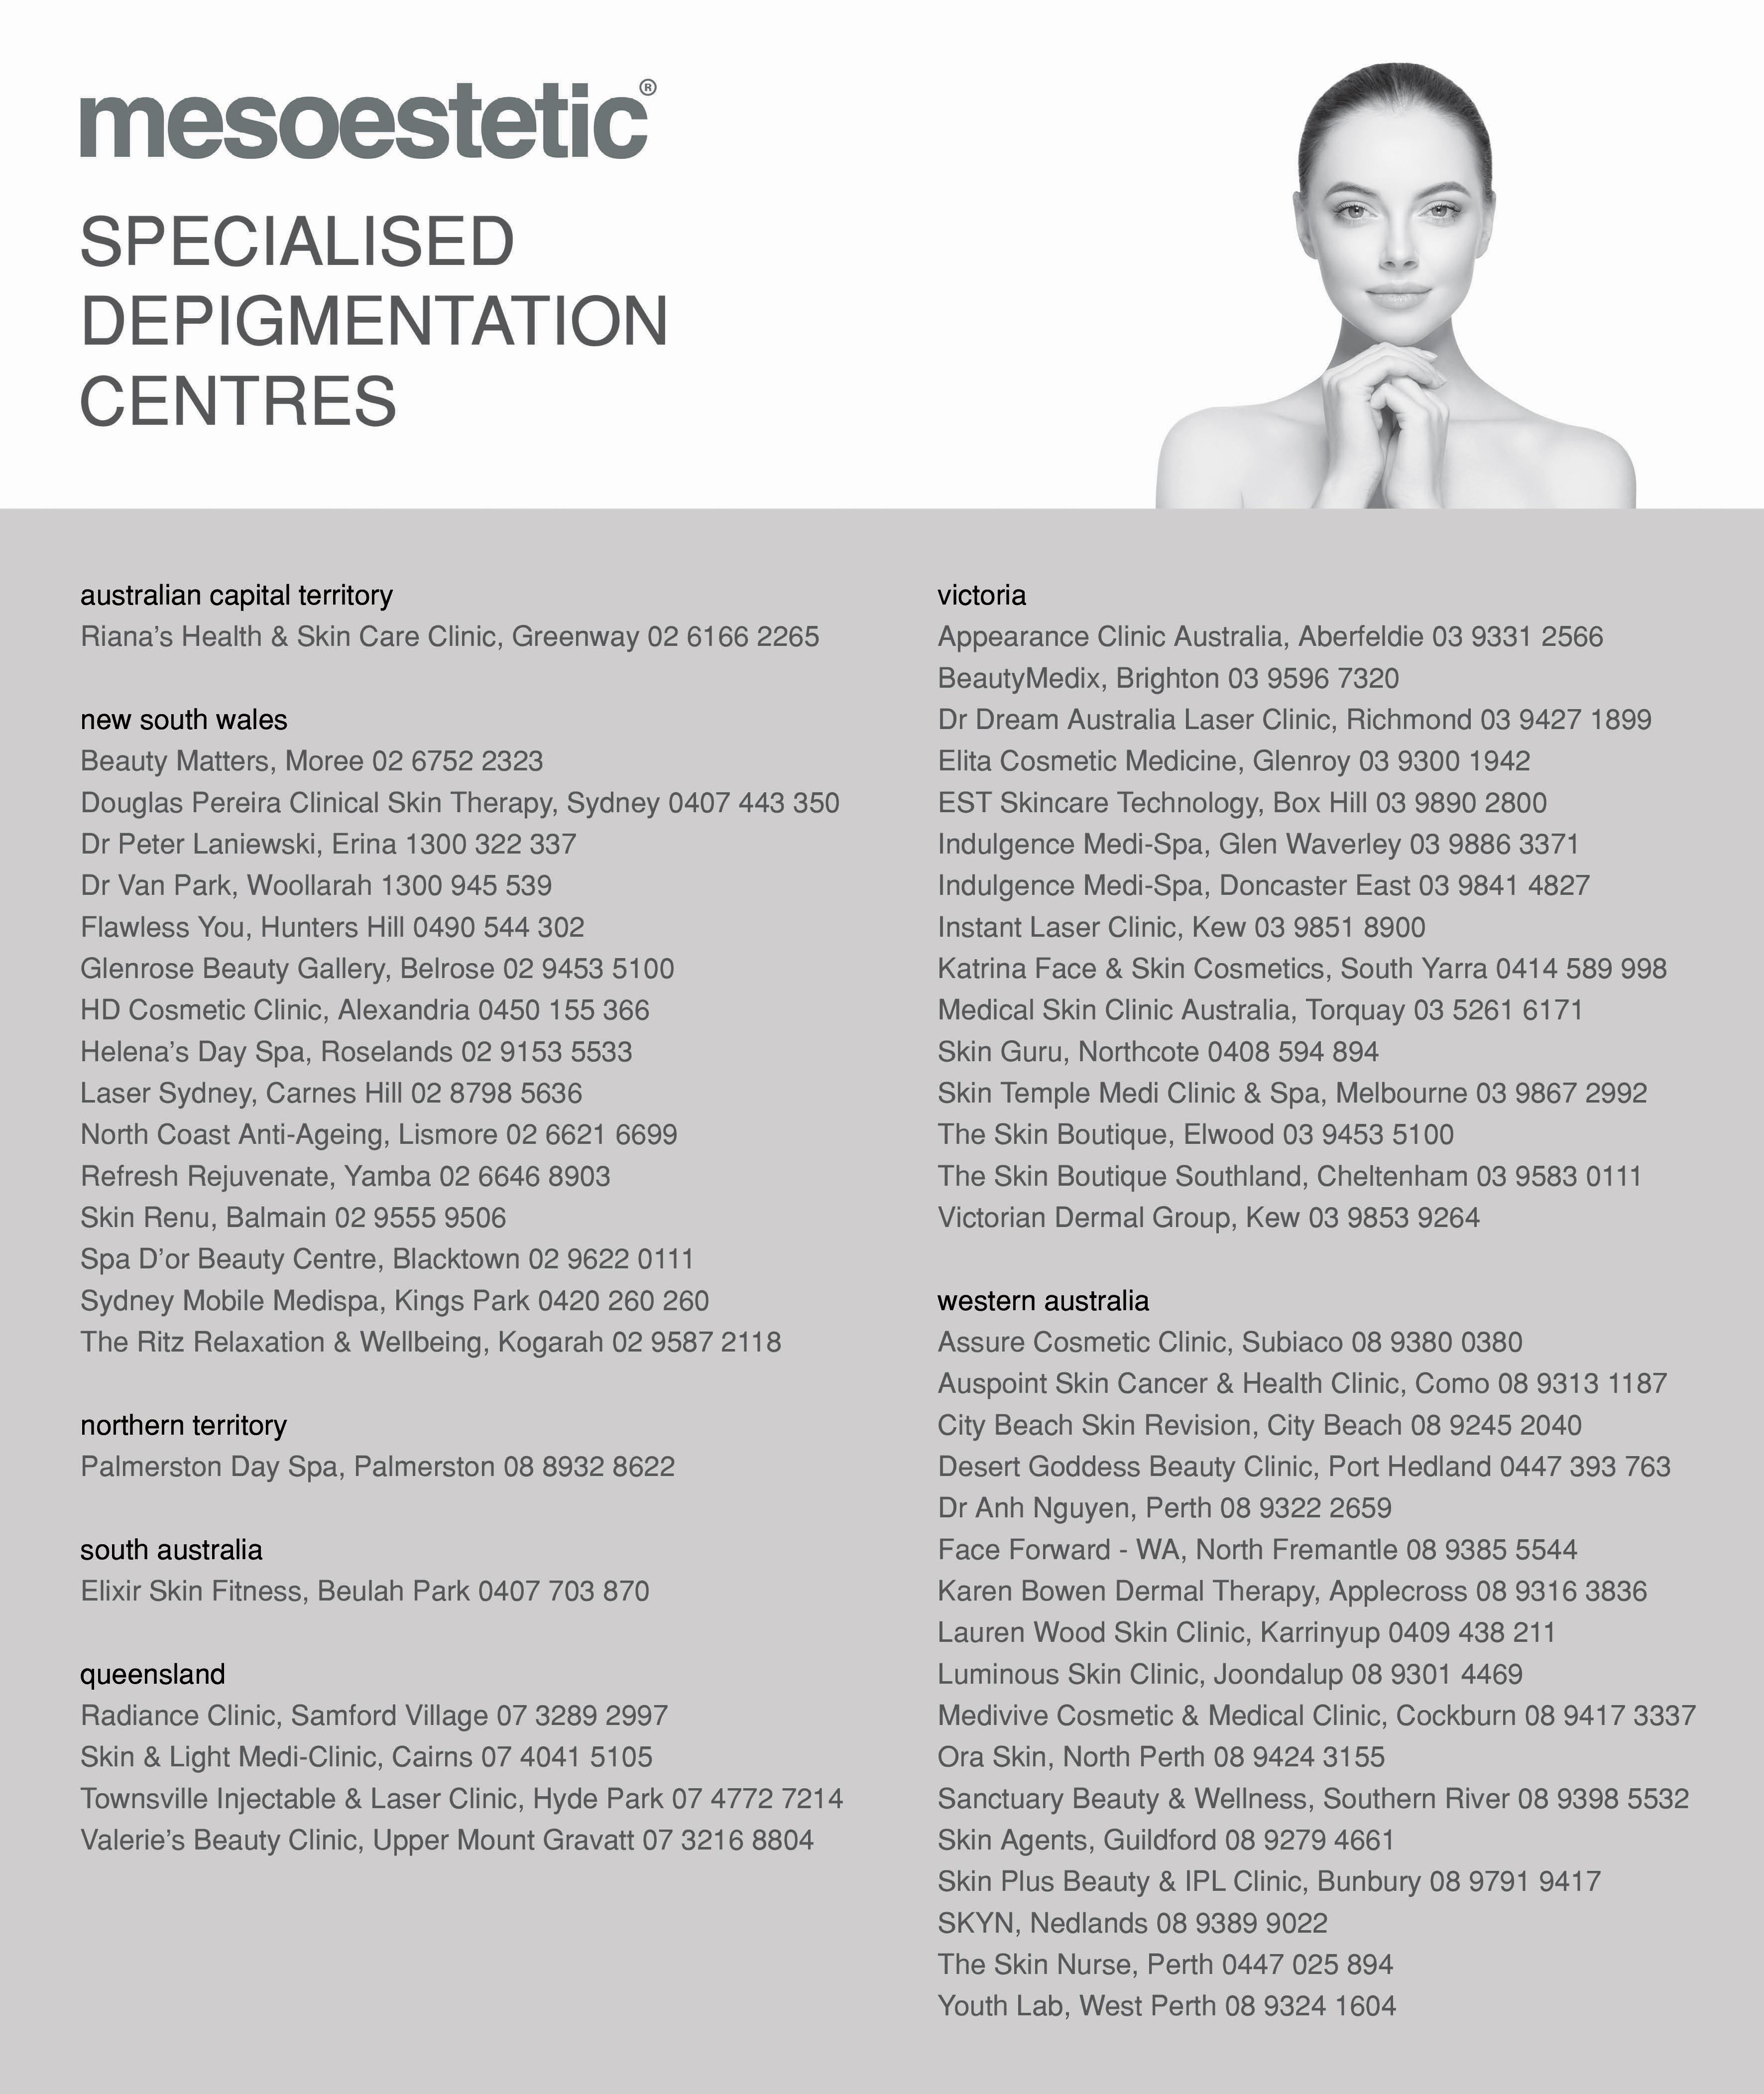 Cosmelan Dermal Peel — Riana's Health Skin Care Clinic